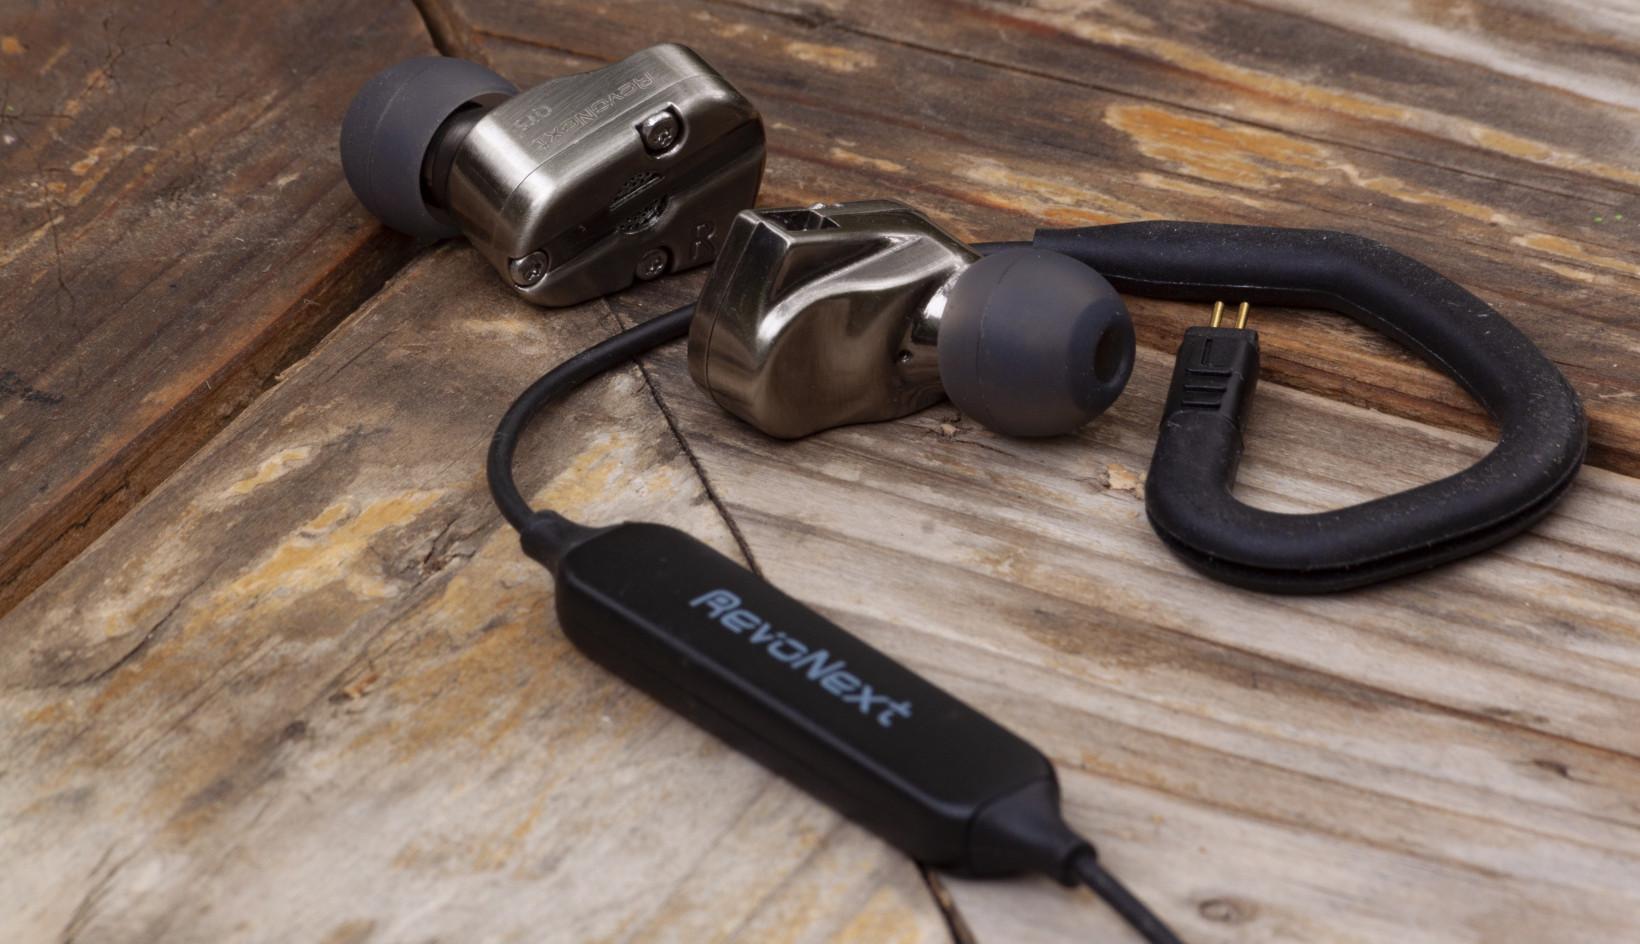 RevoNext's QT5 Earphones are among the best earphones I've tried